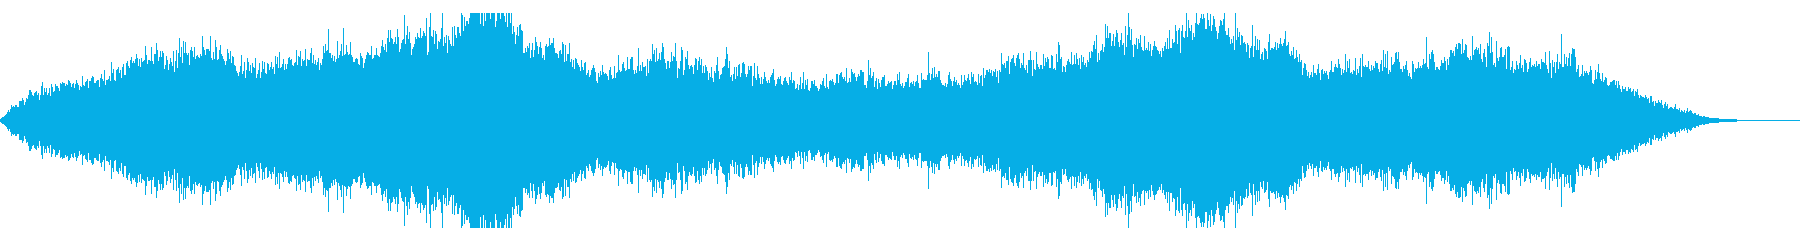 drone2の再生済みの波形